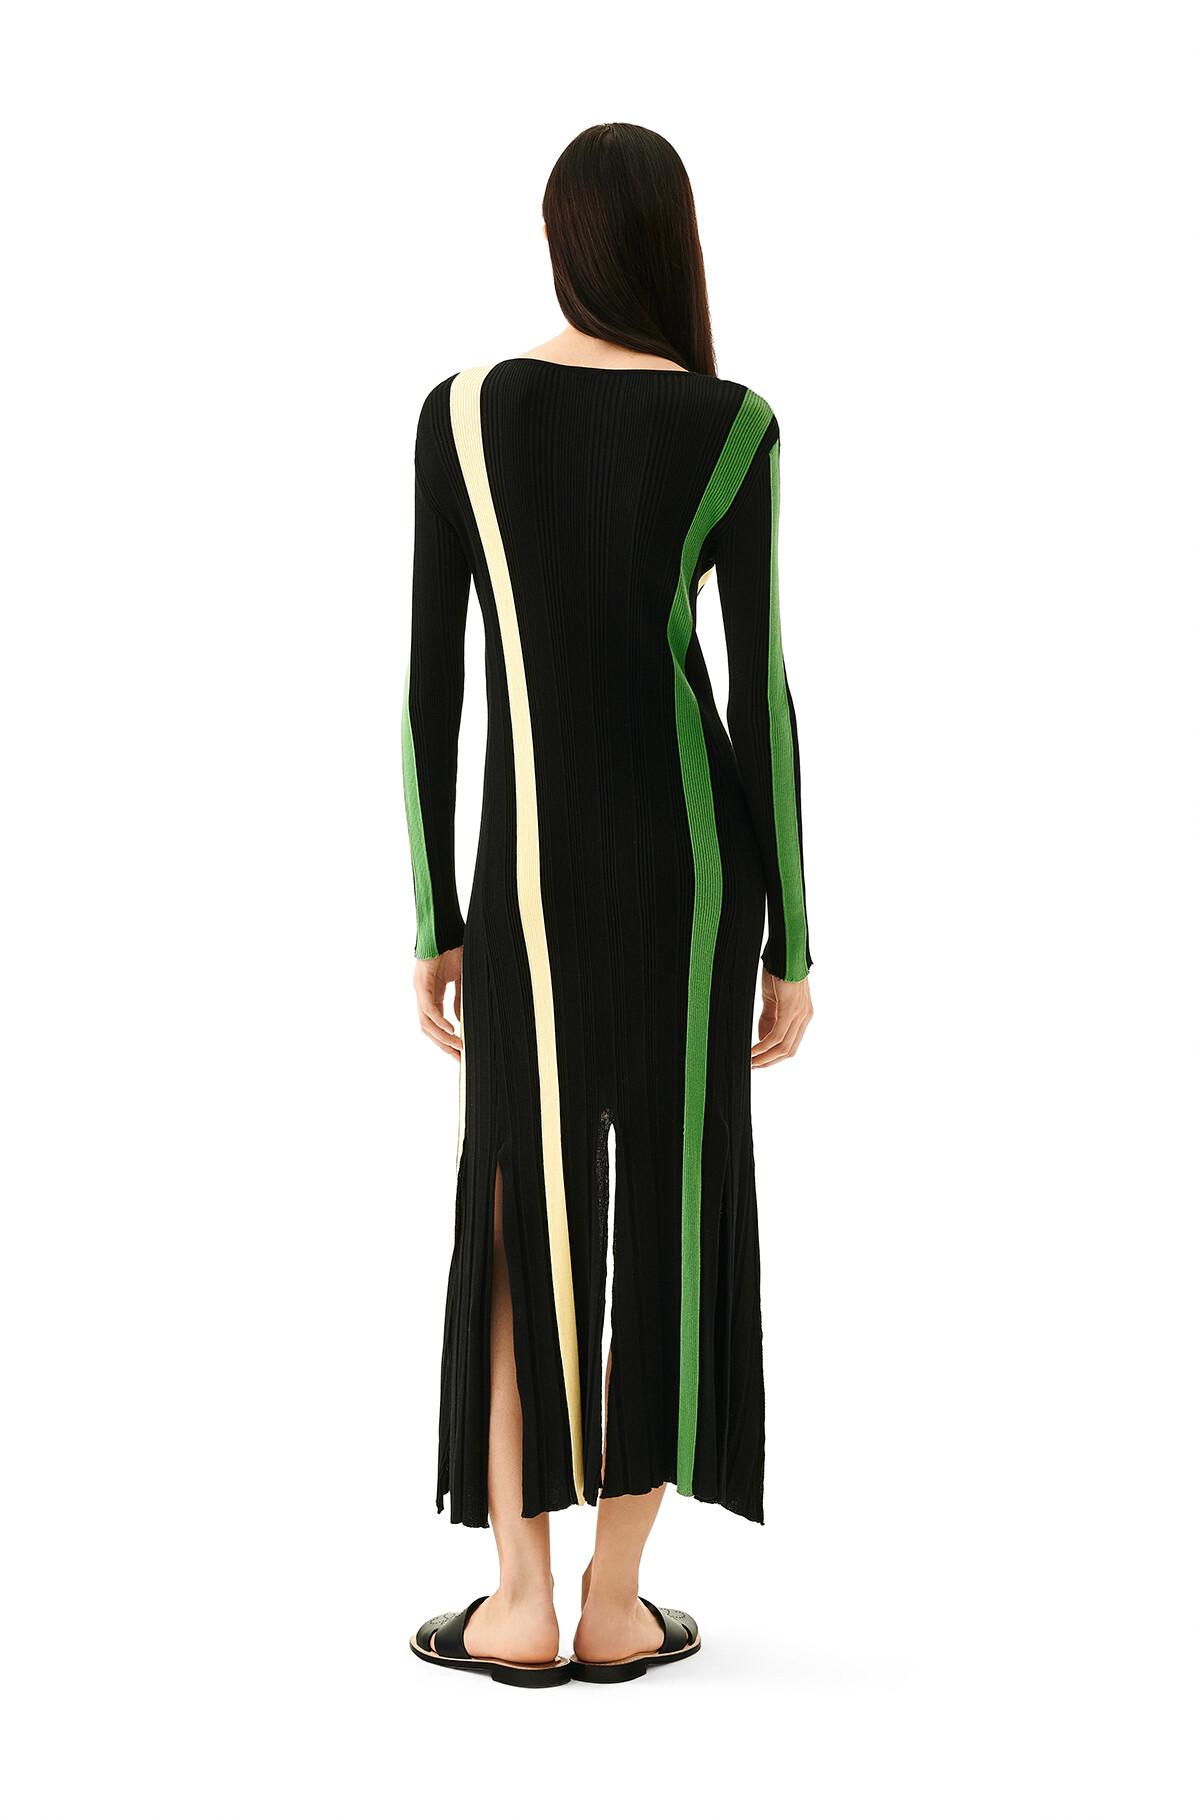 LOEWE Stripe Rib Knit Dress Yellow/Black front